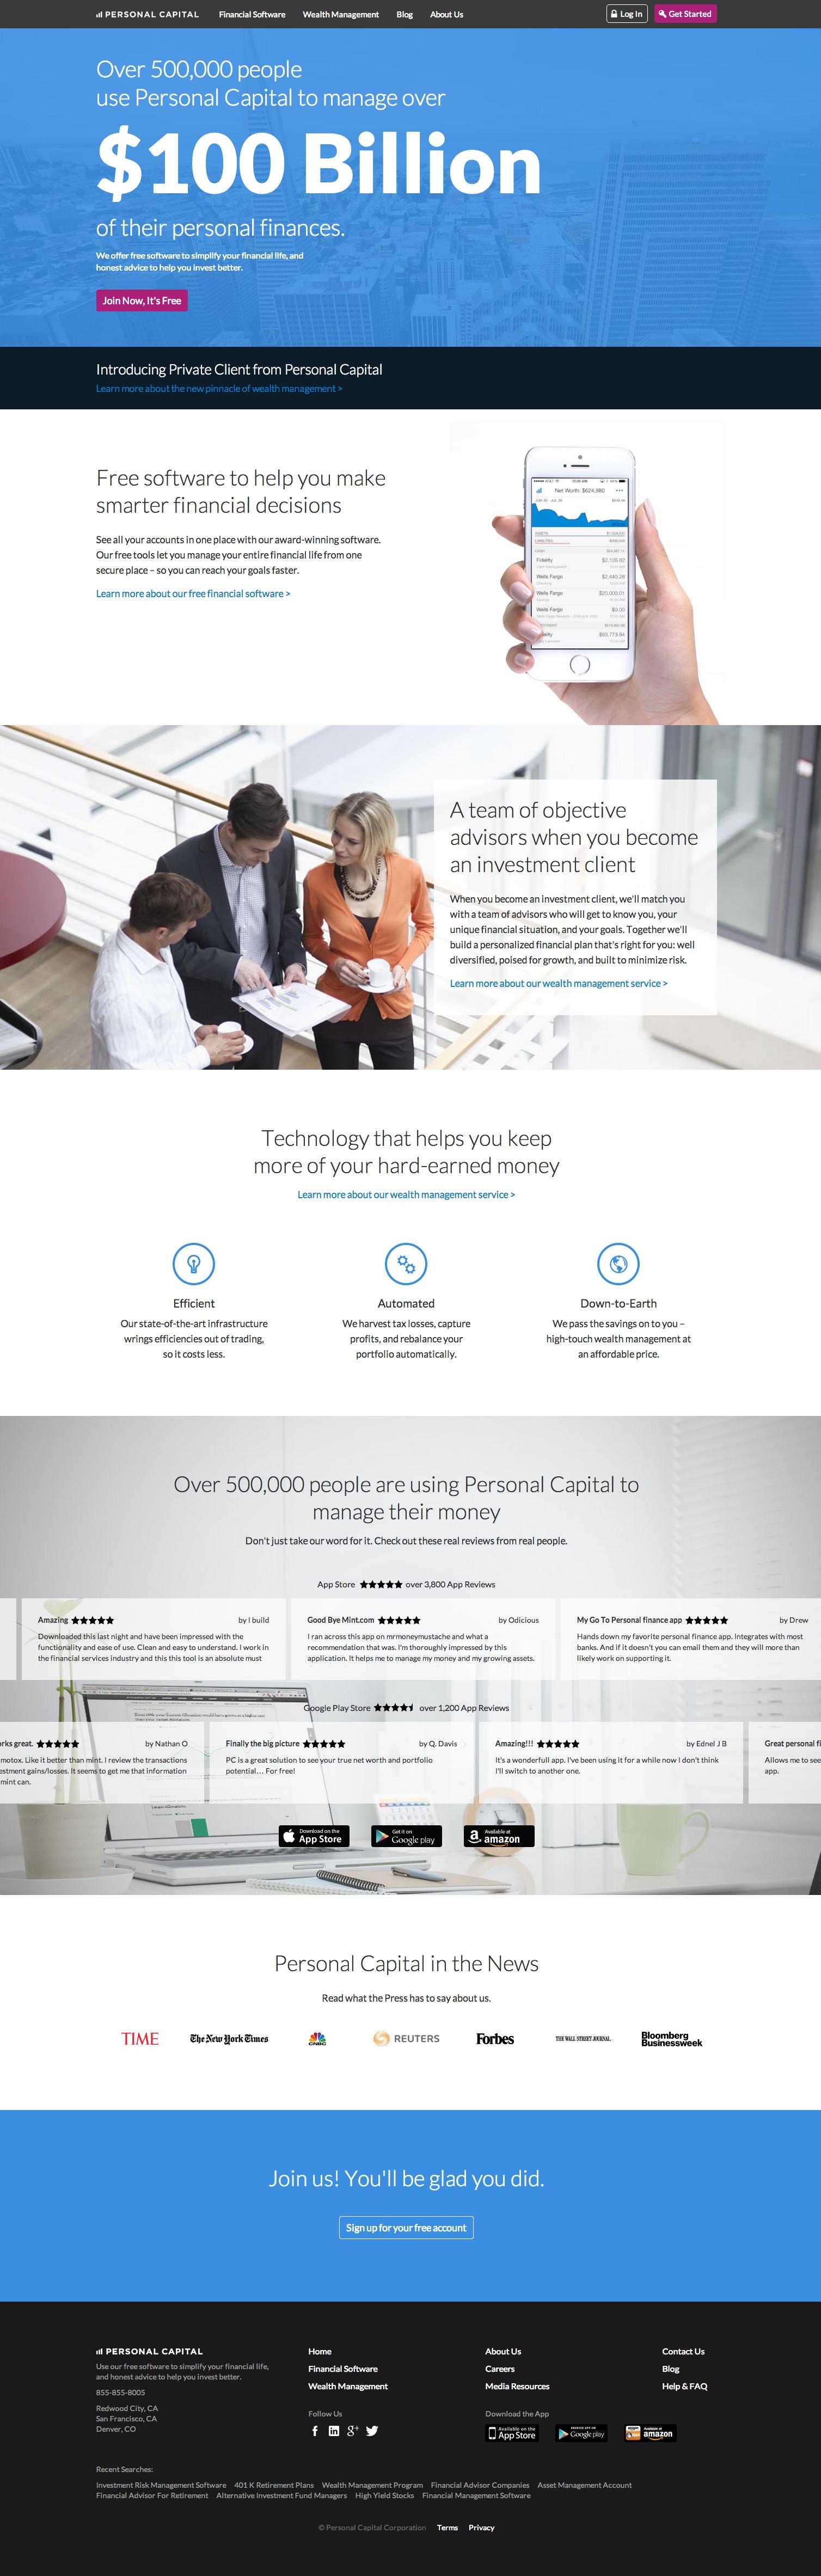 personal capital homepage consumeraffairs